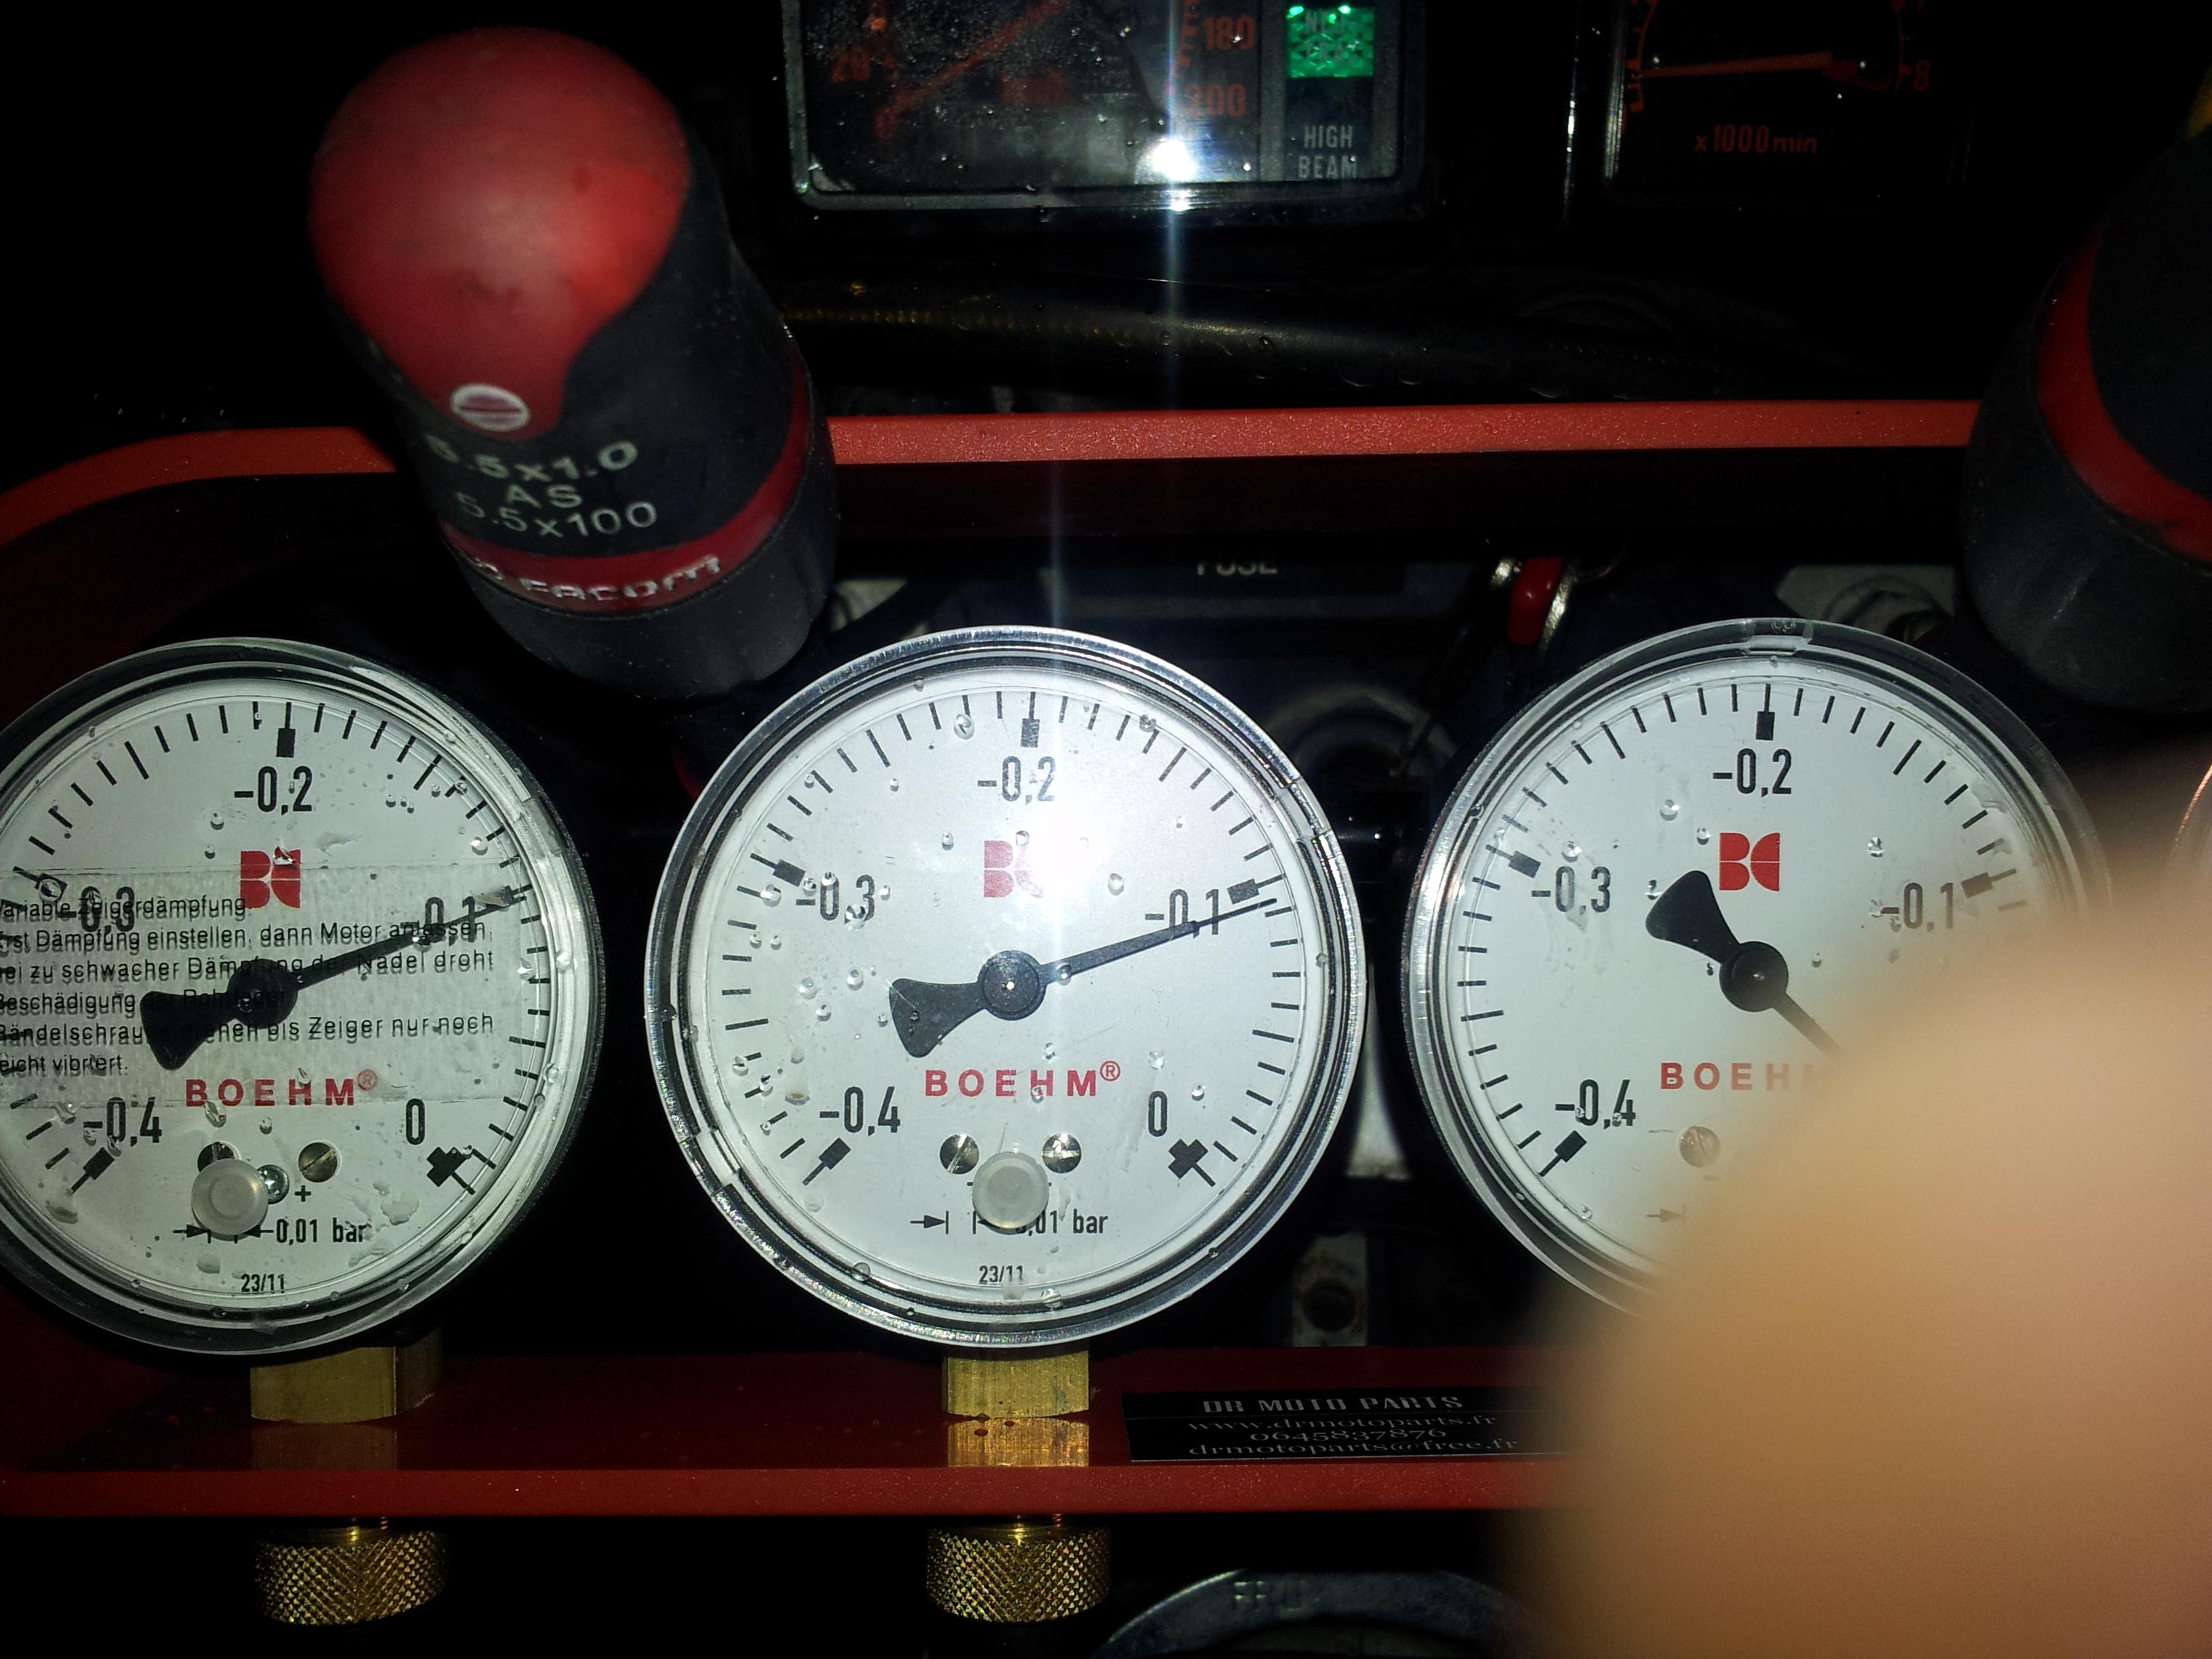 XLV 750 : Ralenti accéléré (2000/2500 tours/m)  [RESOLU] - Page 3 XLV%20750%20syncro%20800